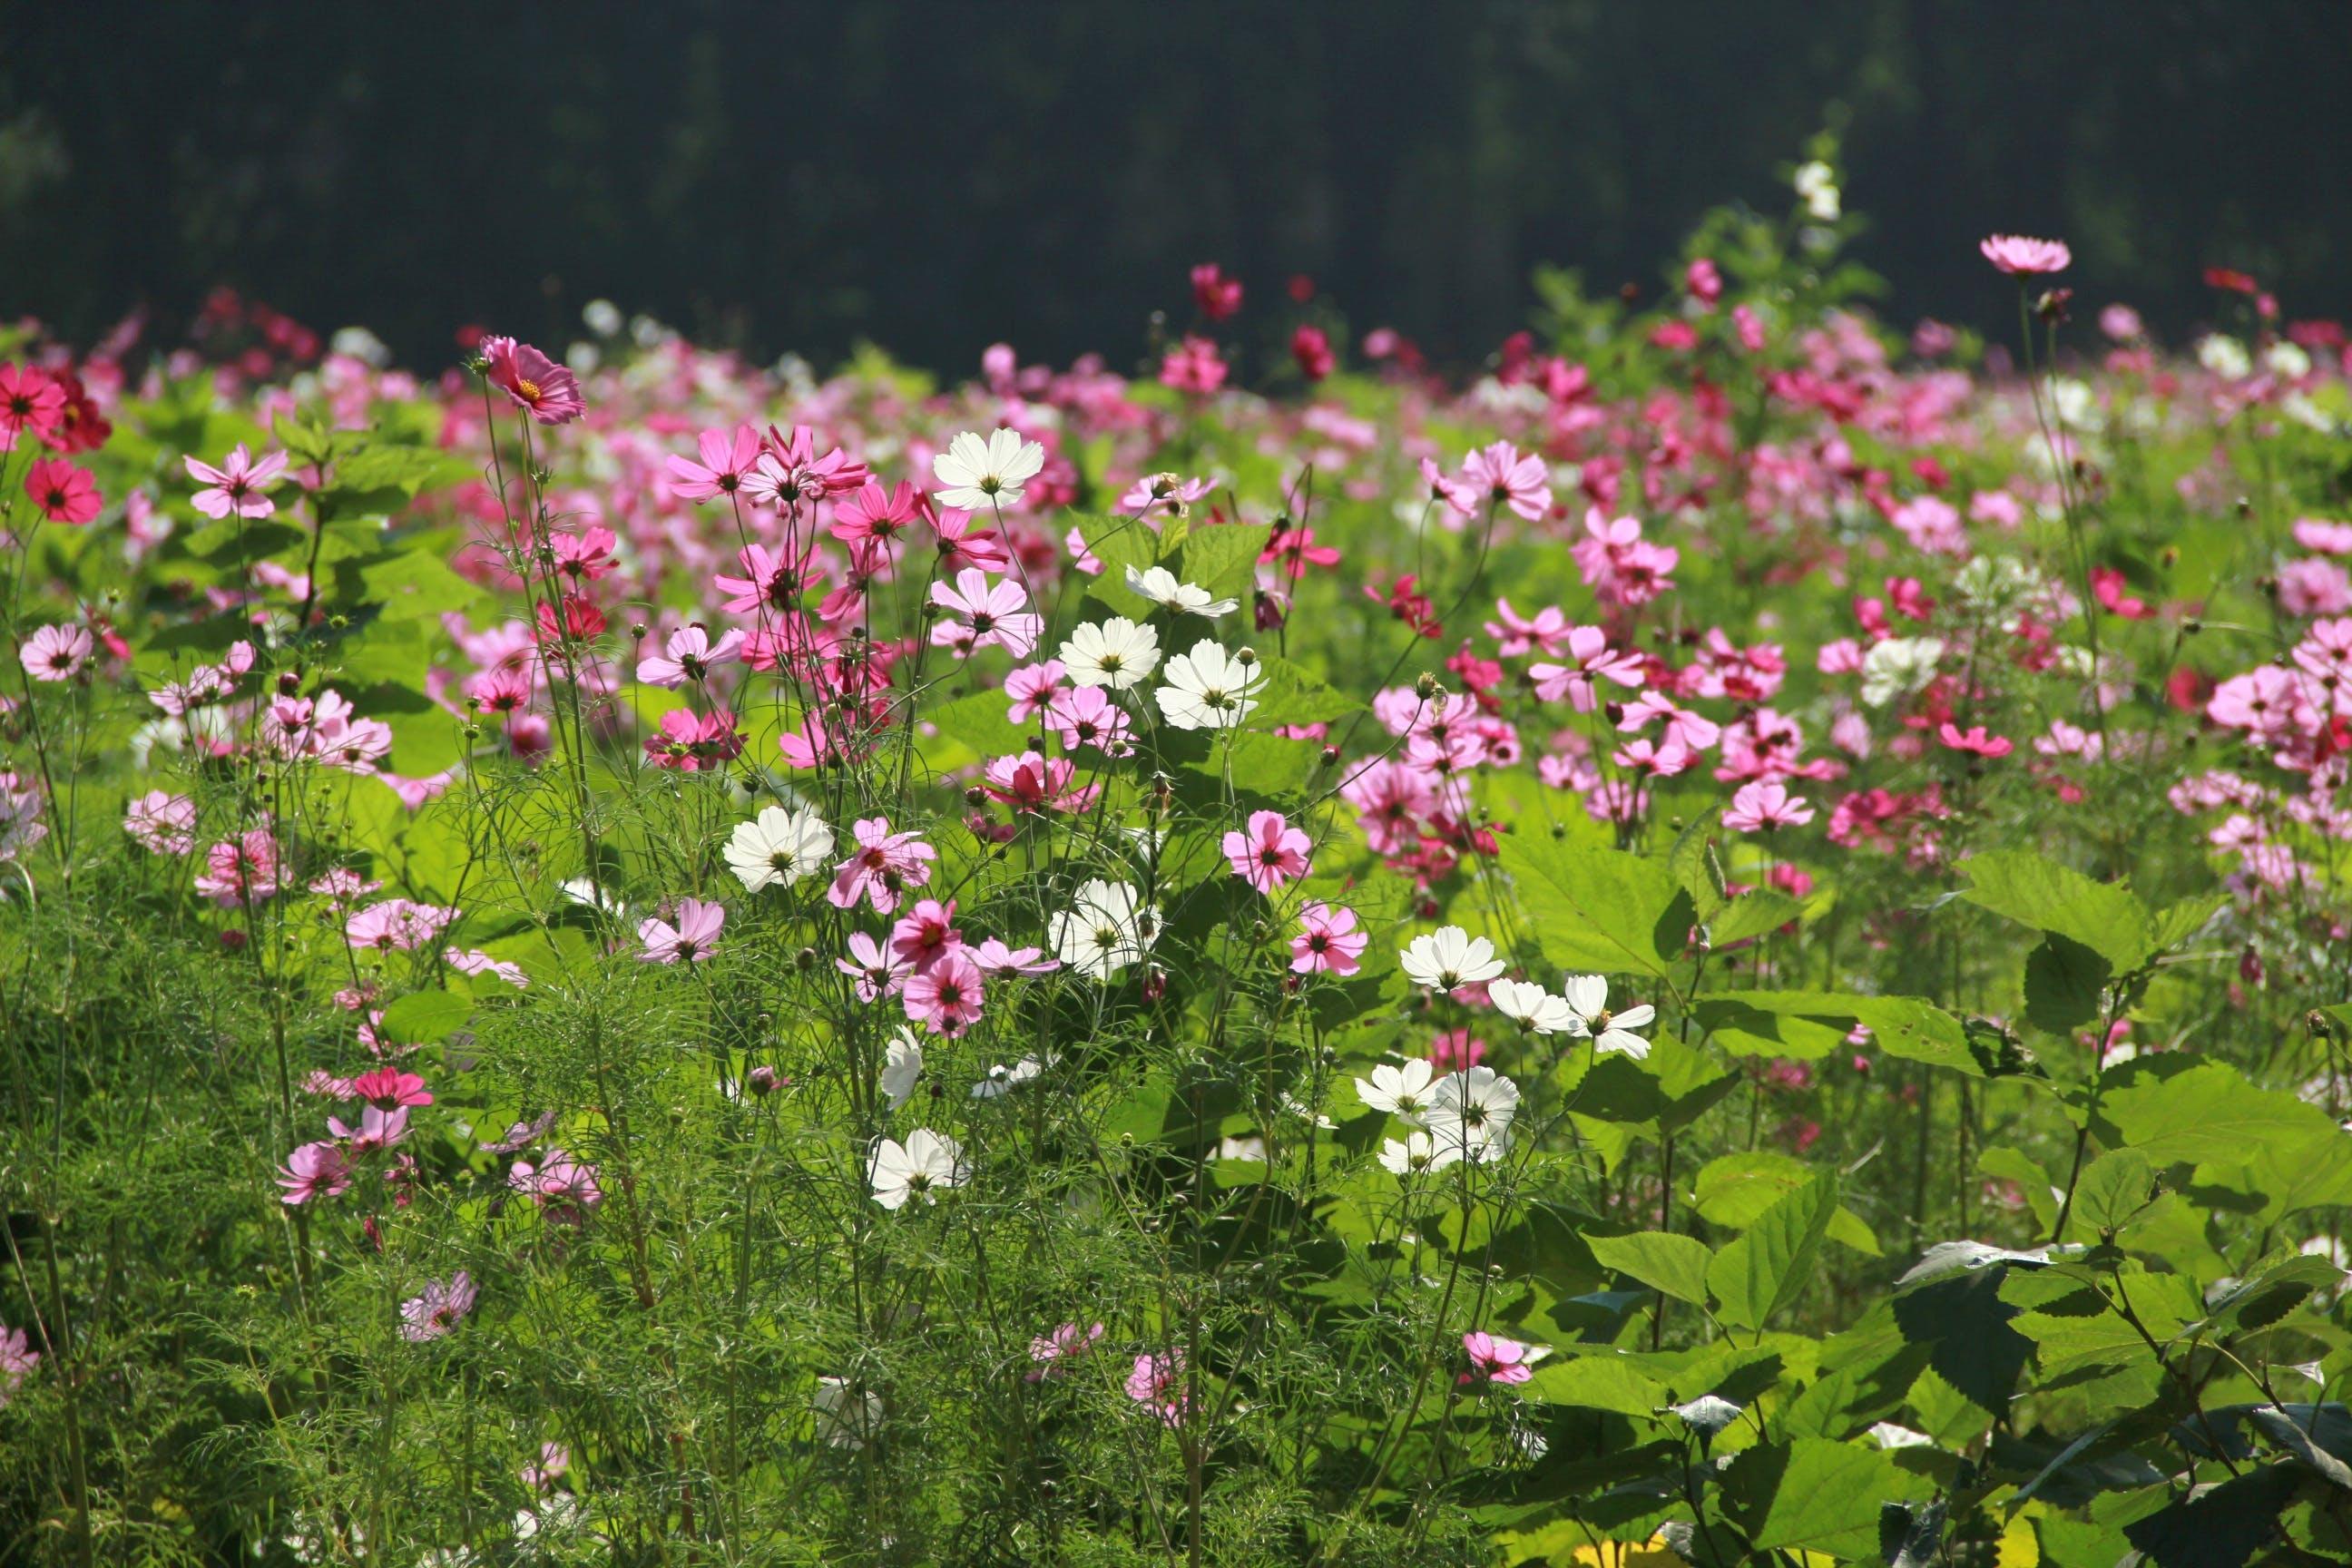 Free stock photo of nature, flowers, garden, cosmos